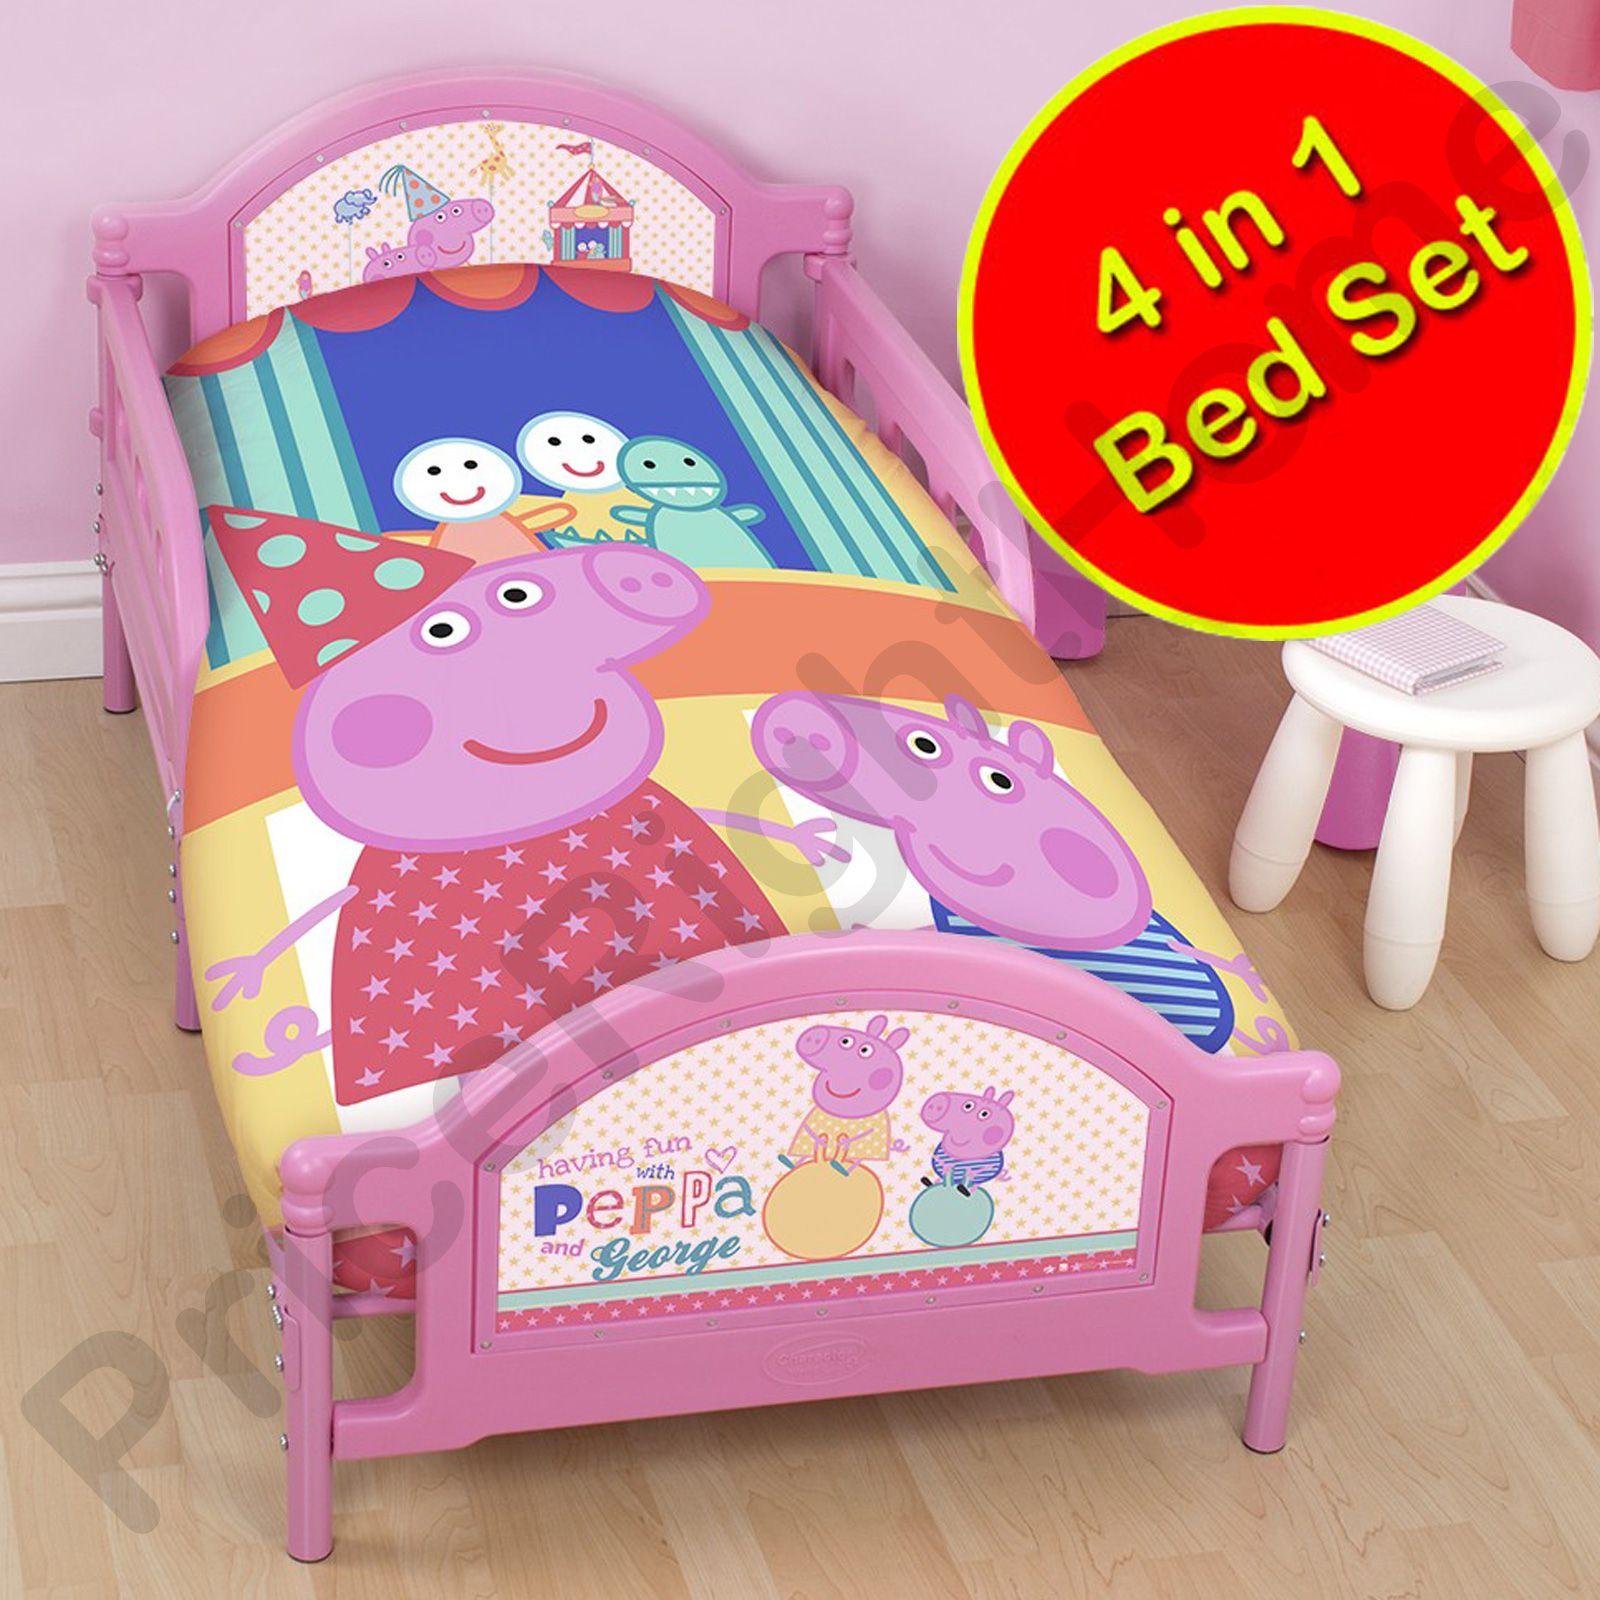 Disney Amp Character 4 In 1 Toddler Bedding Bundles Duvet